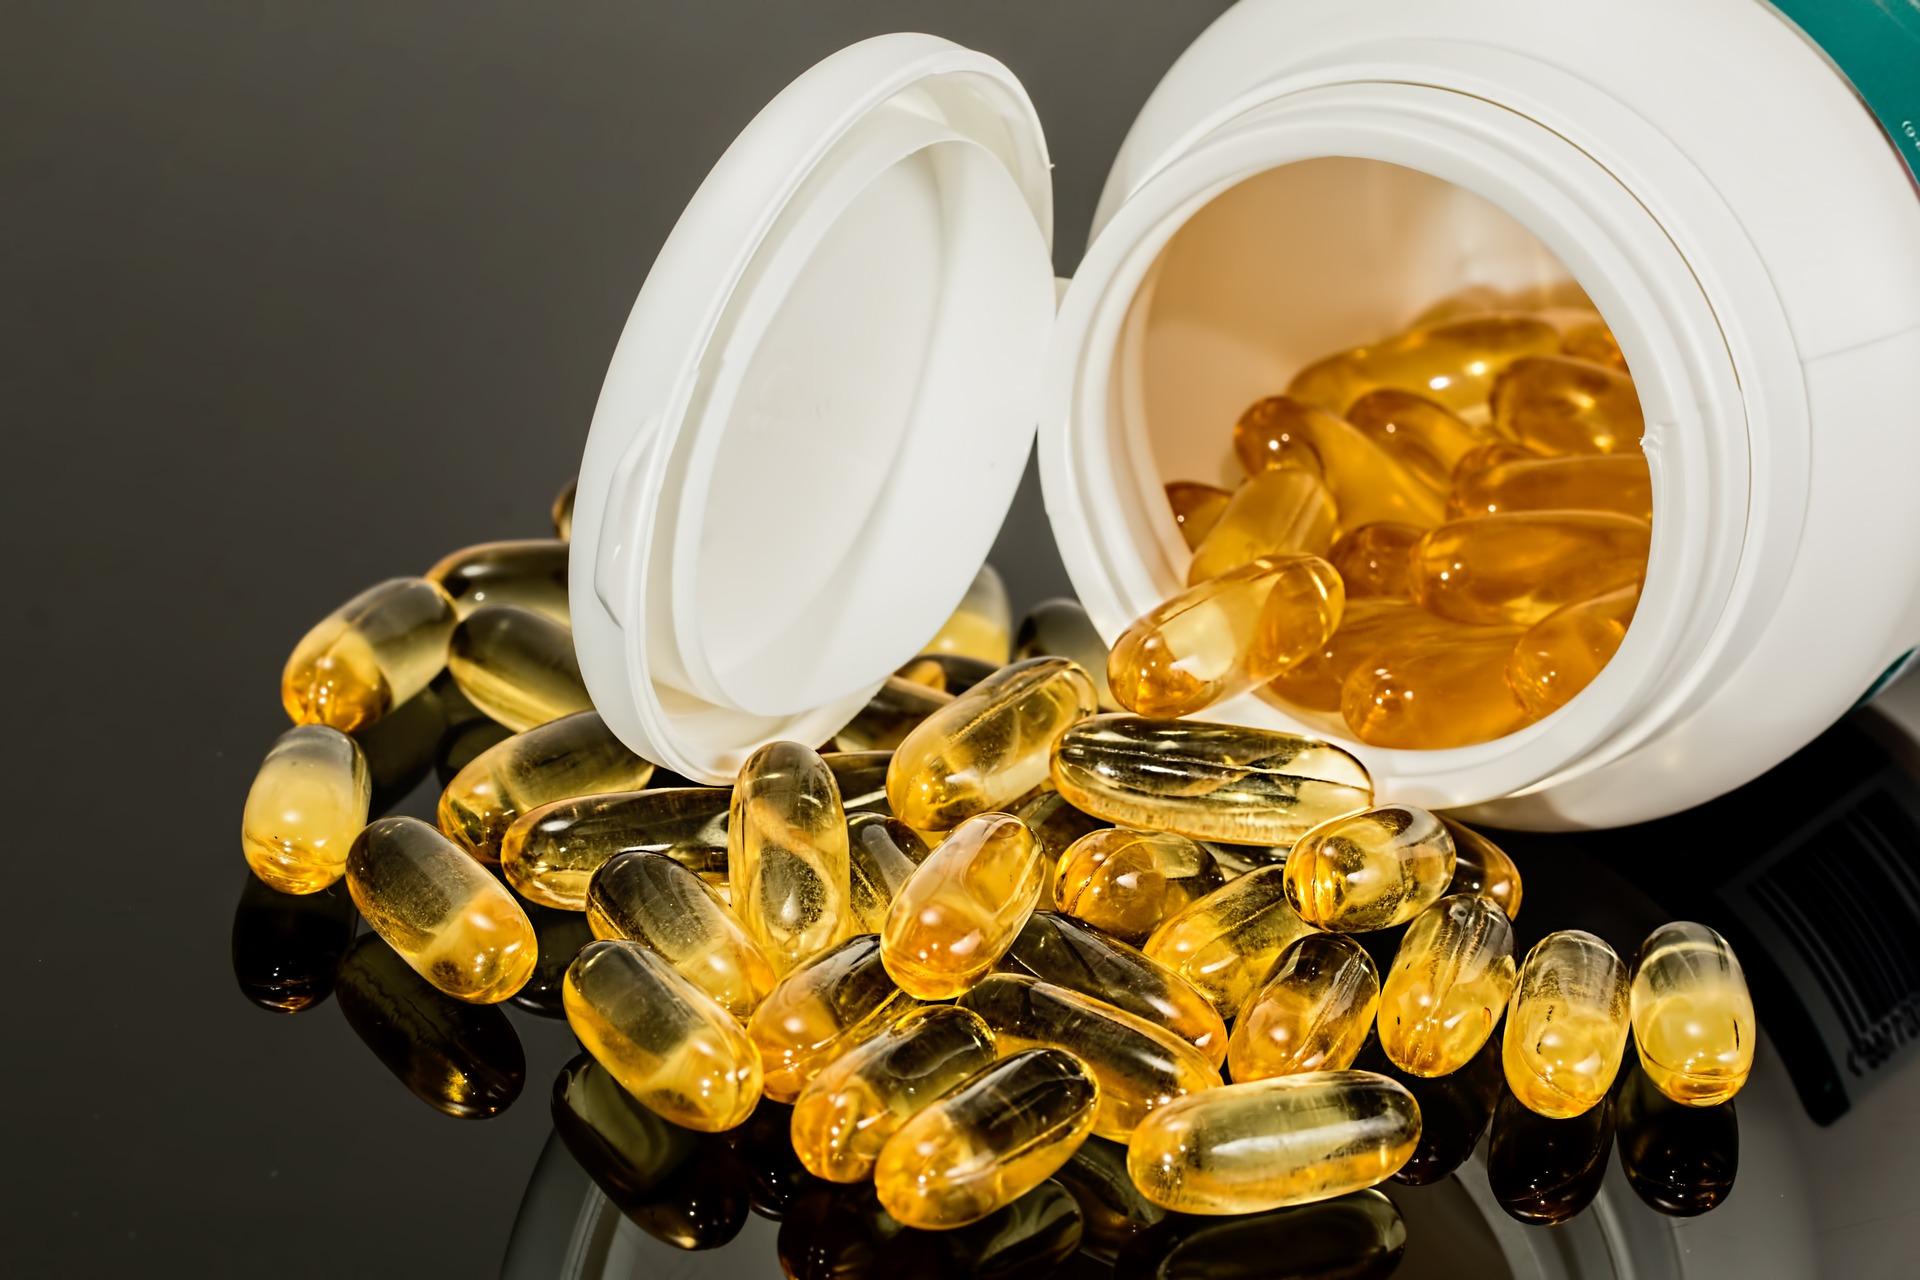 Hoje tá pago! | Suplementos e remédios para emagrecer: entenda os riscos e mentiras sobre os produtos